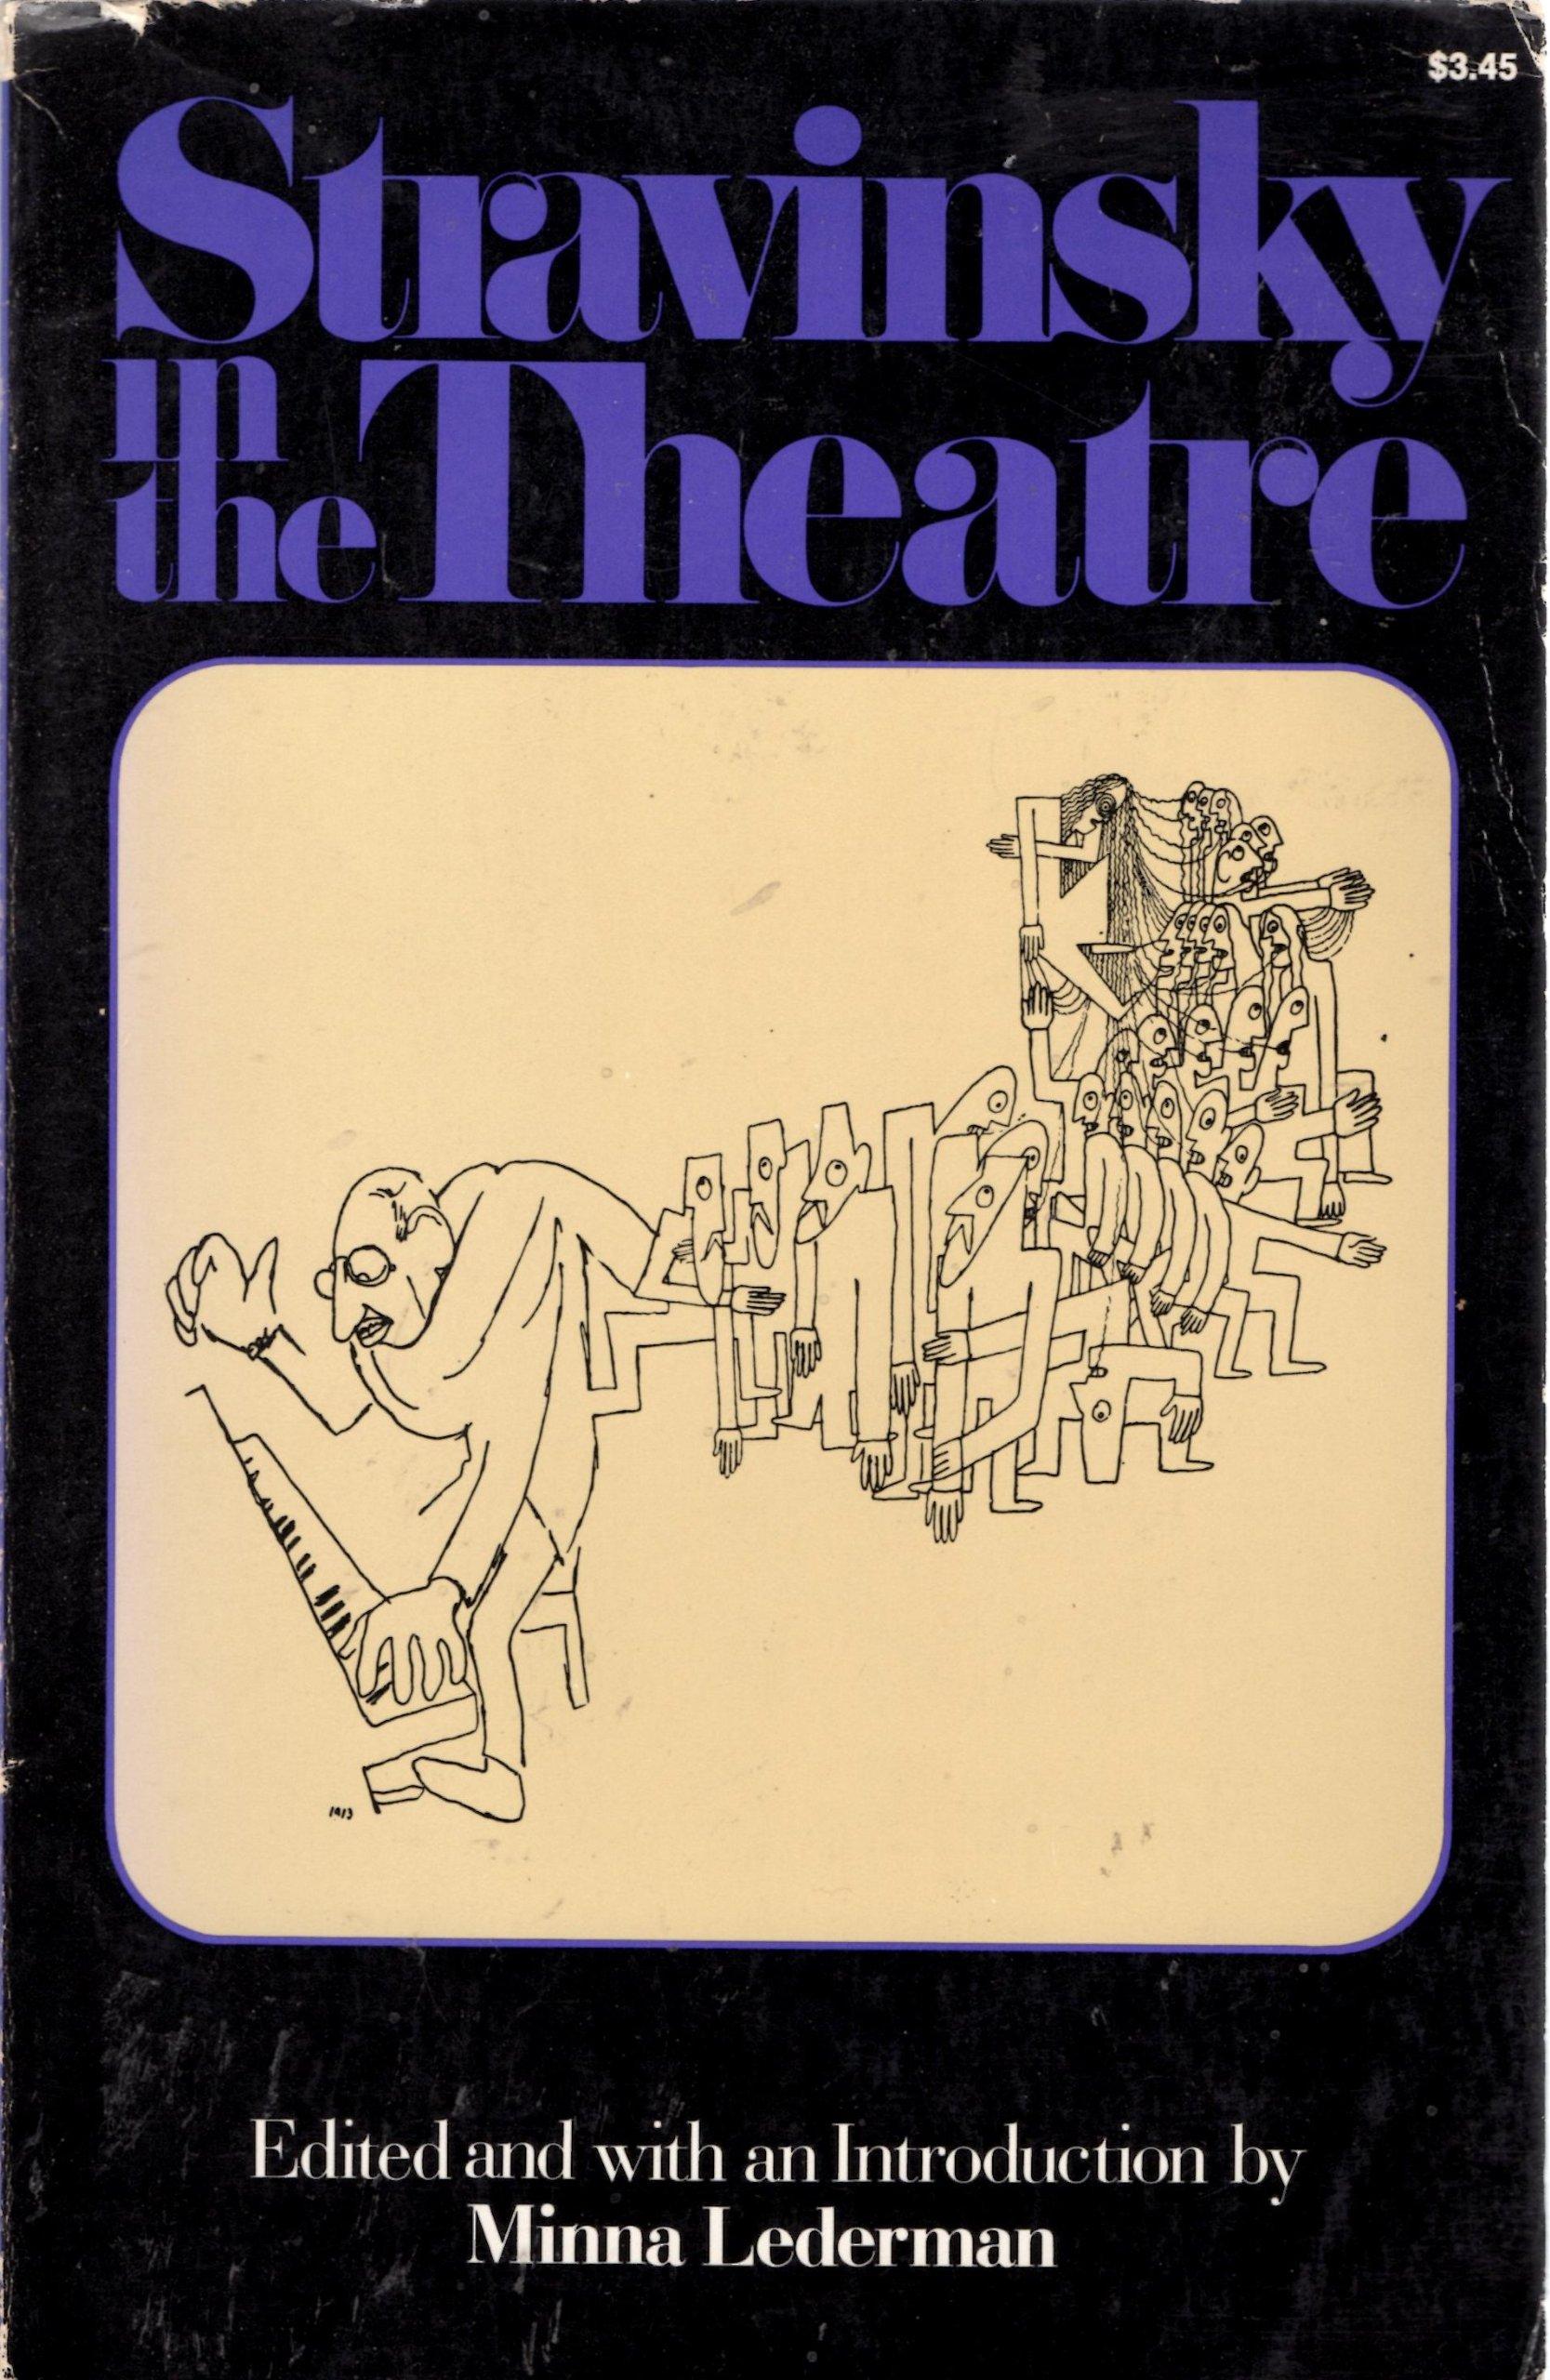 Stravinsky in the Theatre Cover Art